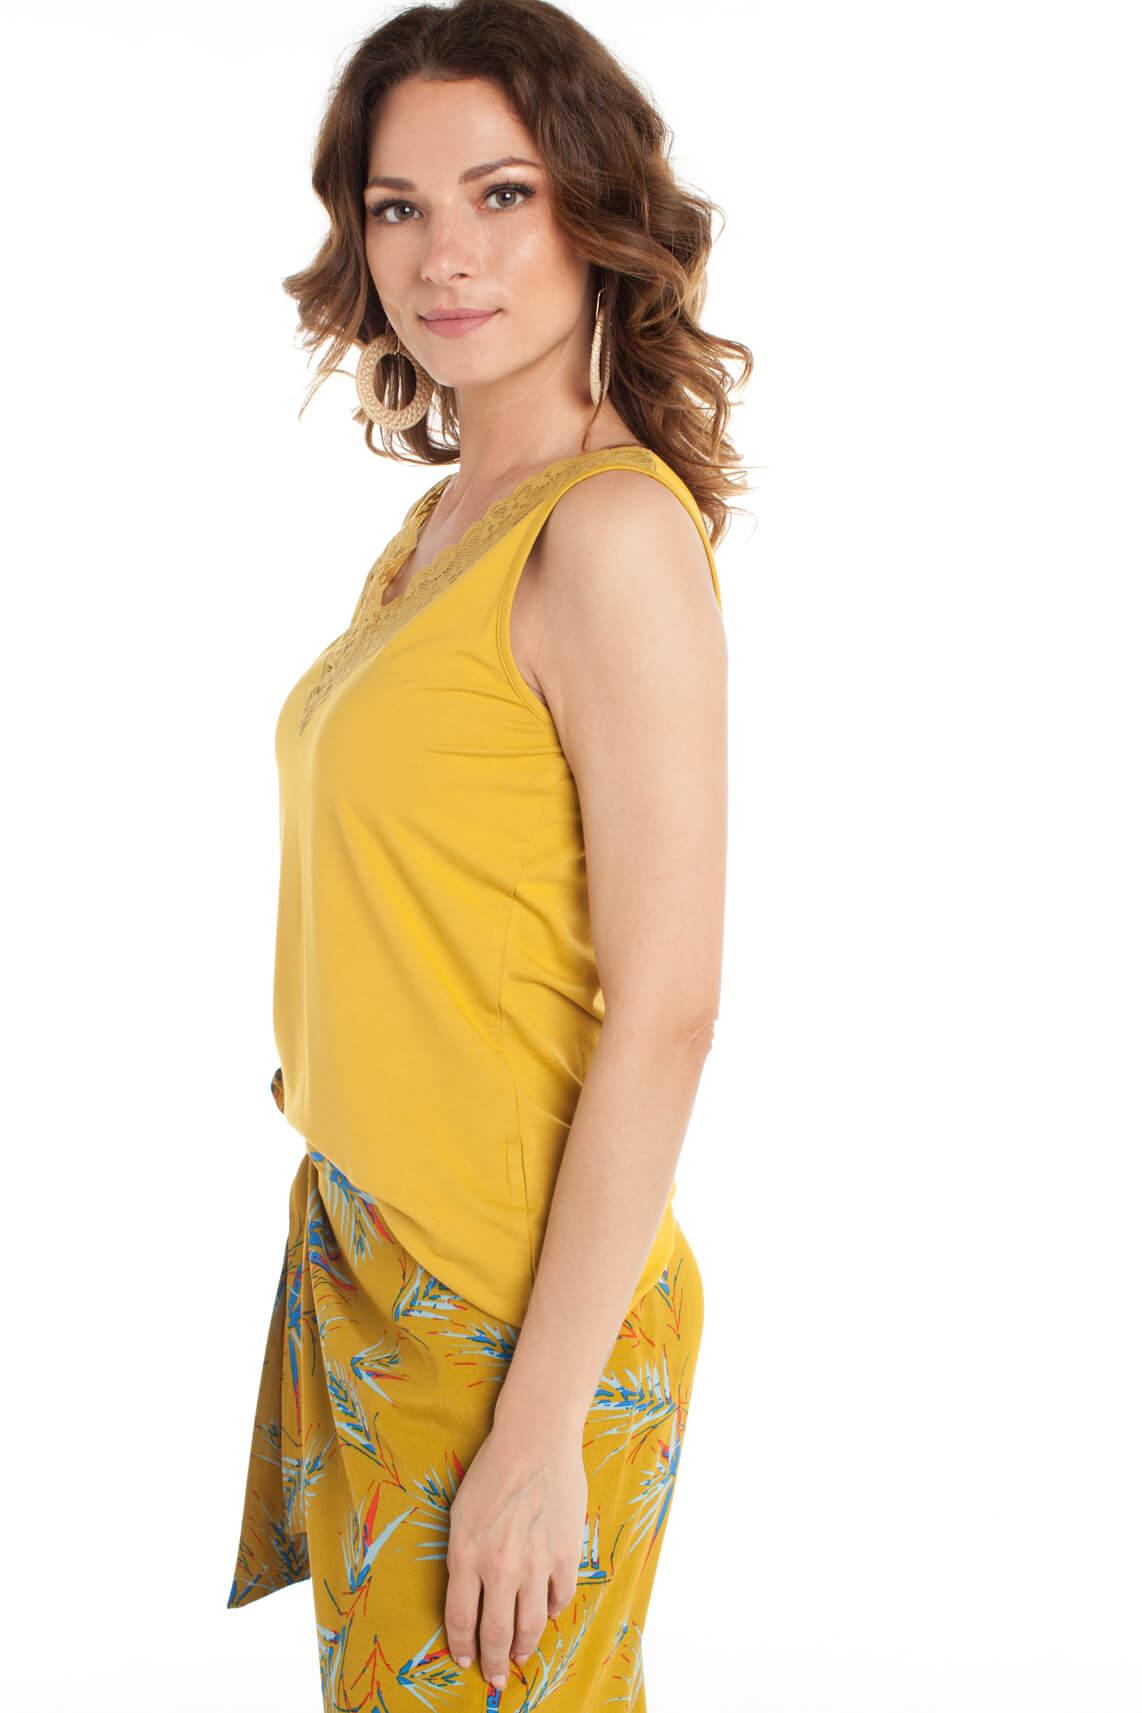 Anna Dames Top met kant geel